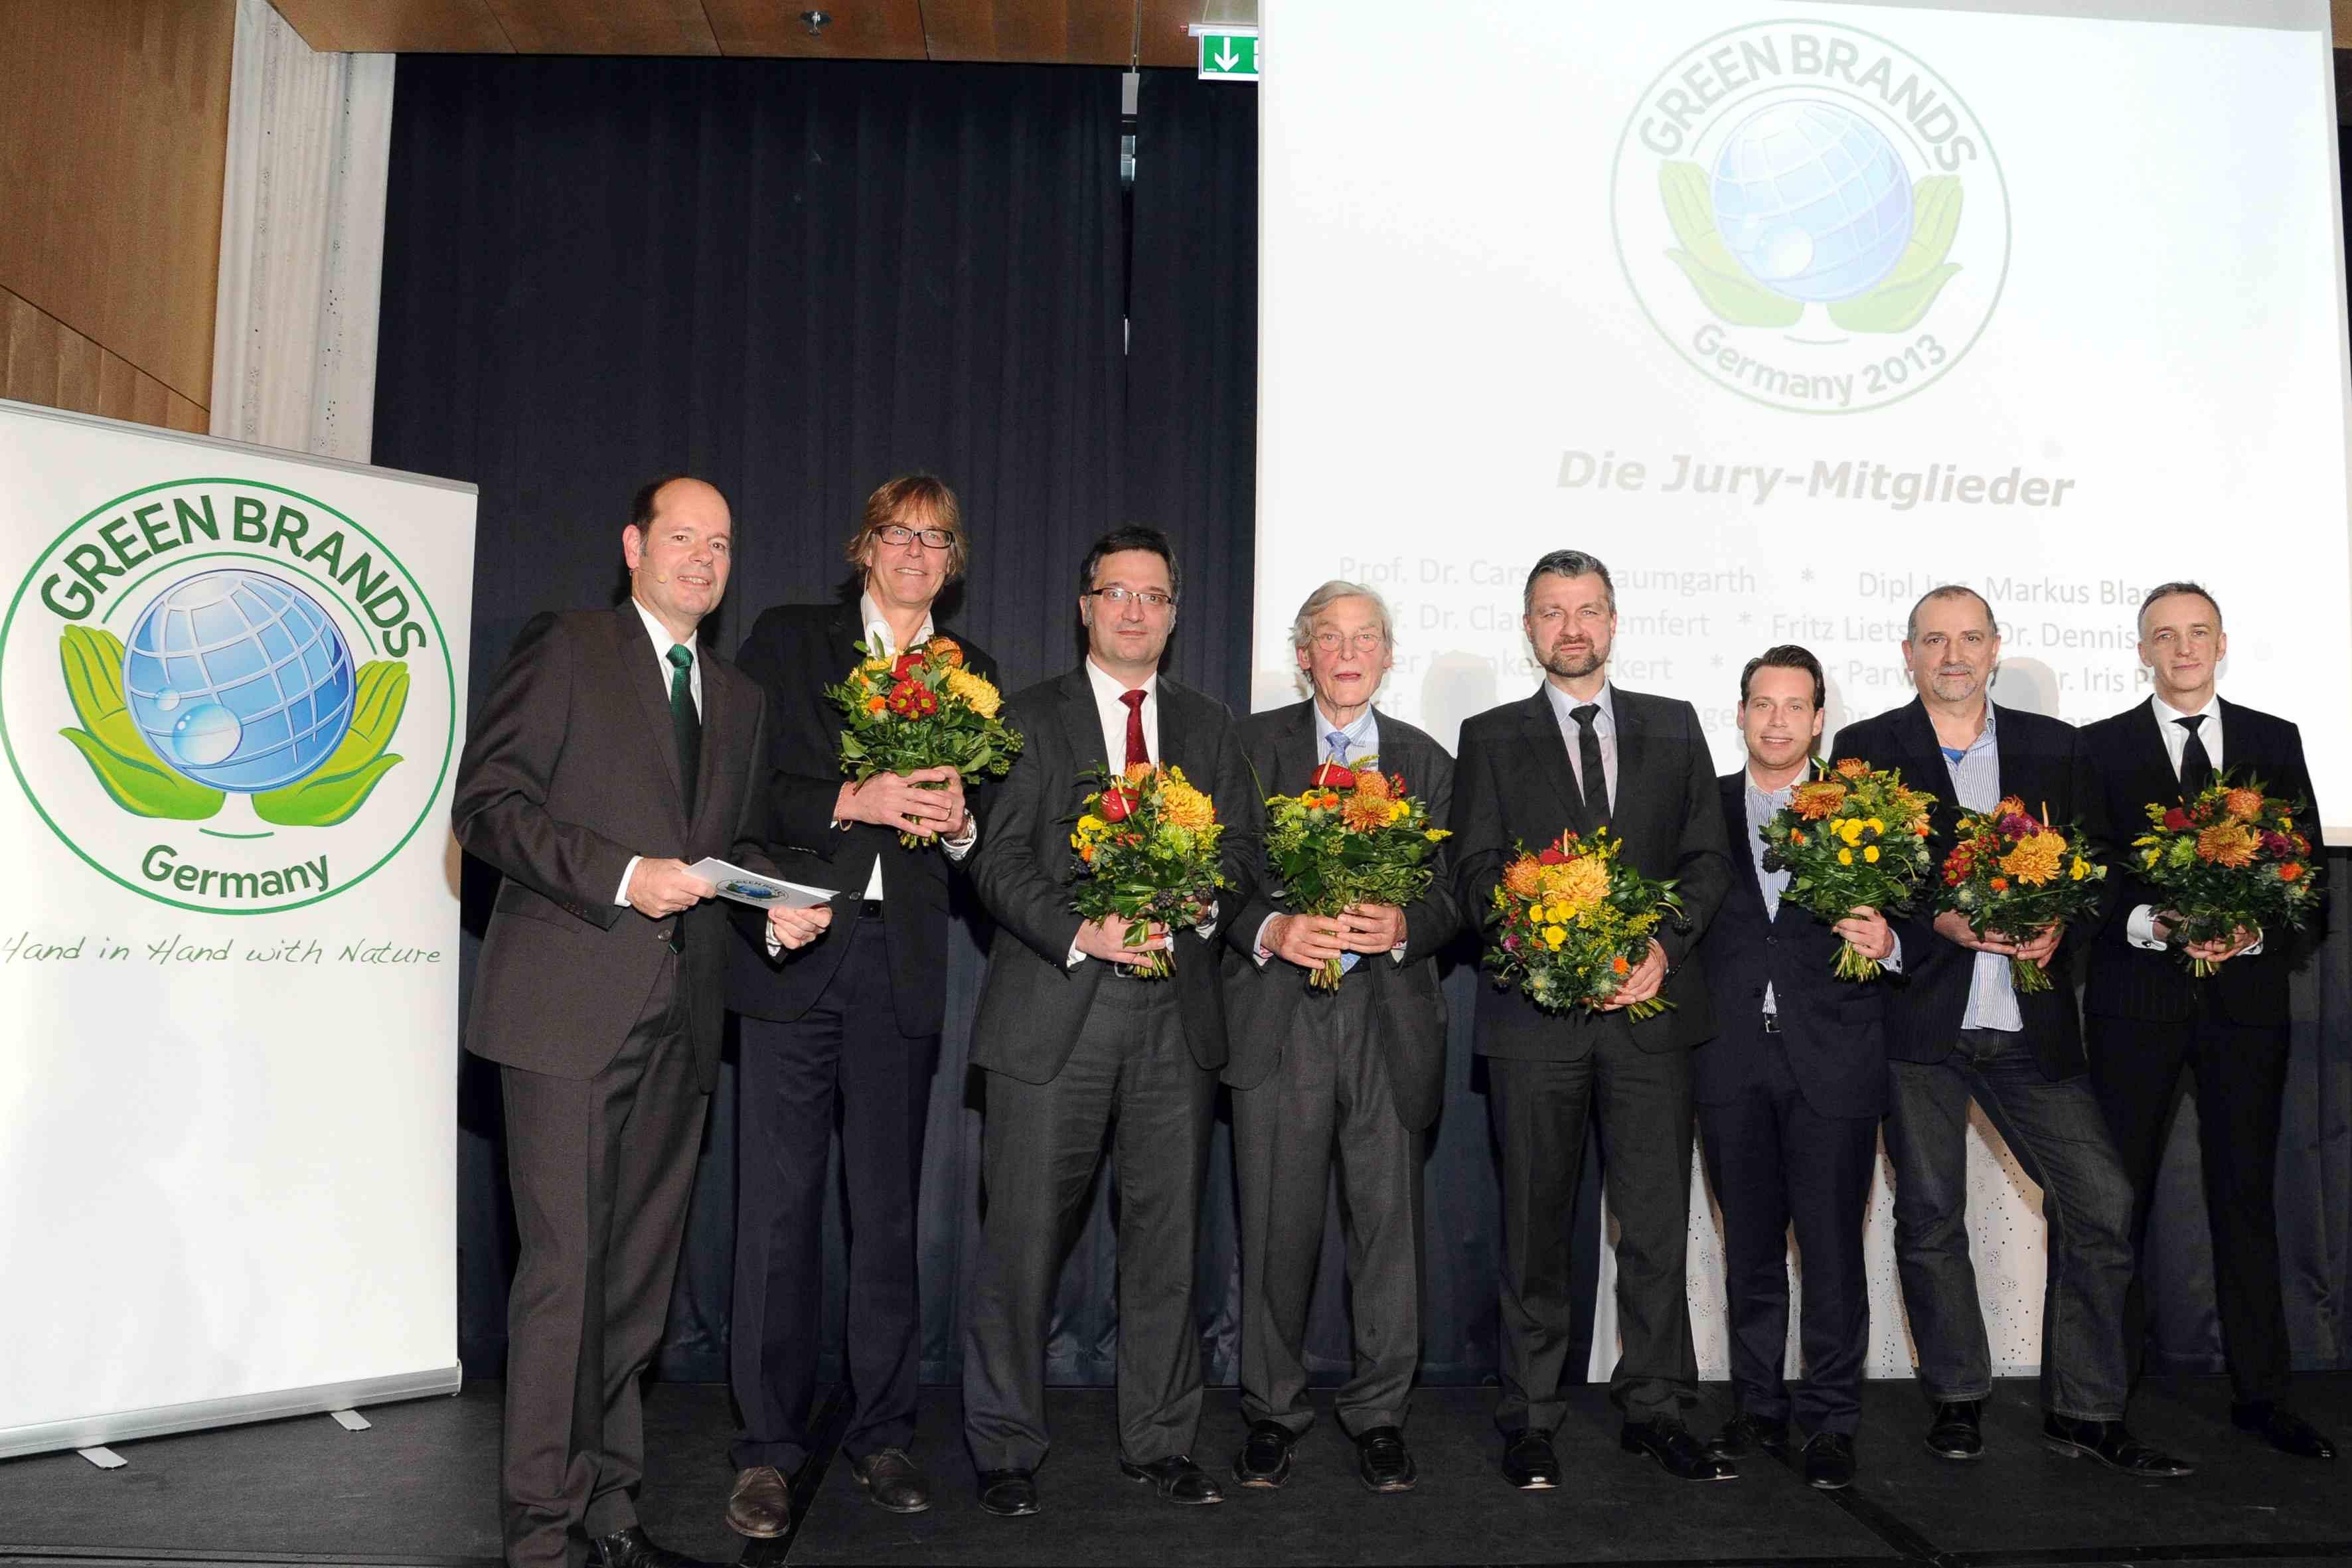 GREEN BRANDS Germany Gala_27.11.2013